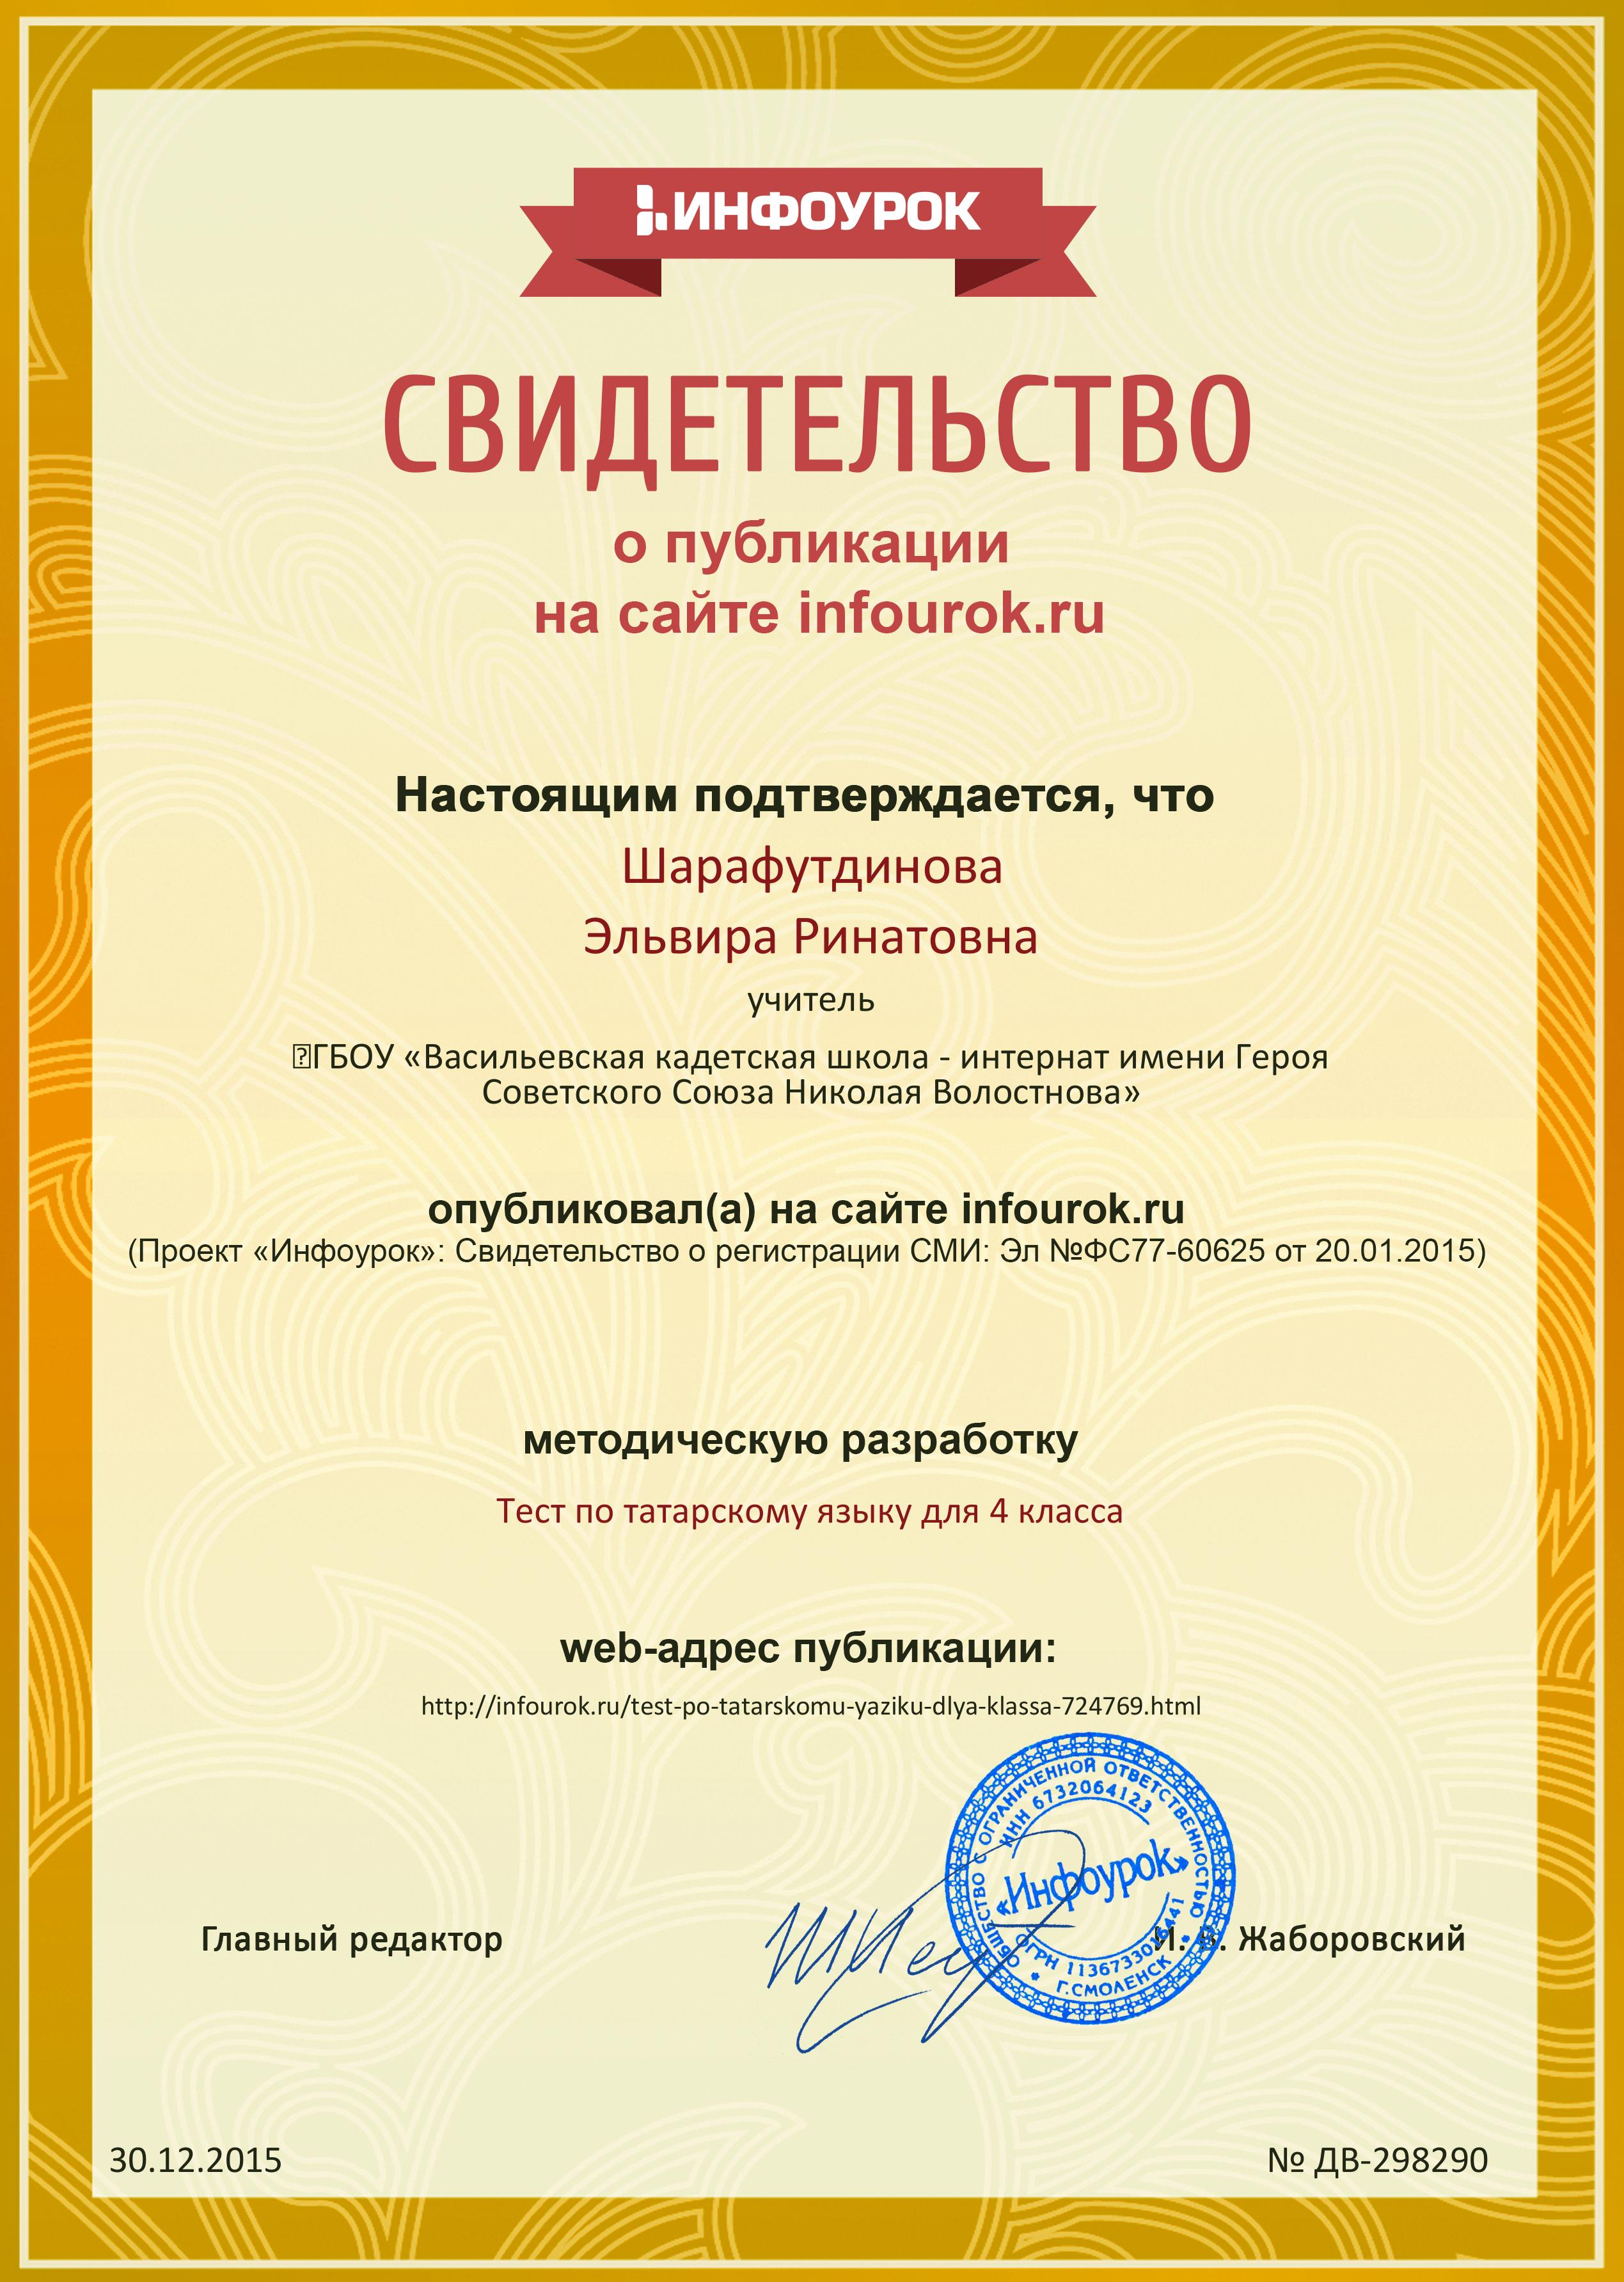 Сертификат проекта infourok.ru № ДВ-298290.jpg